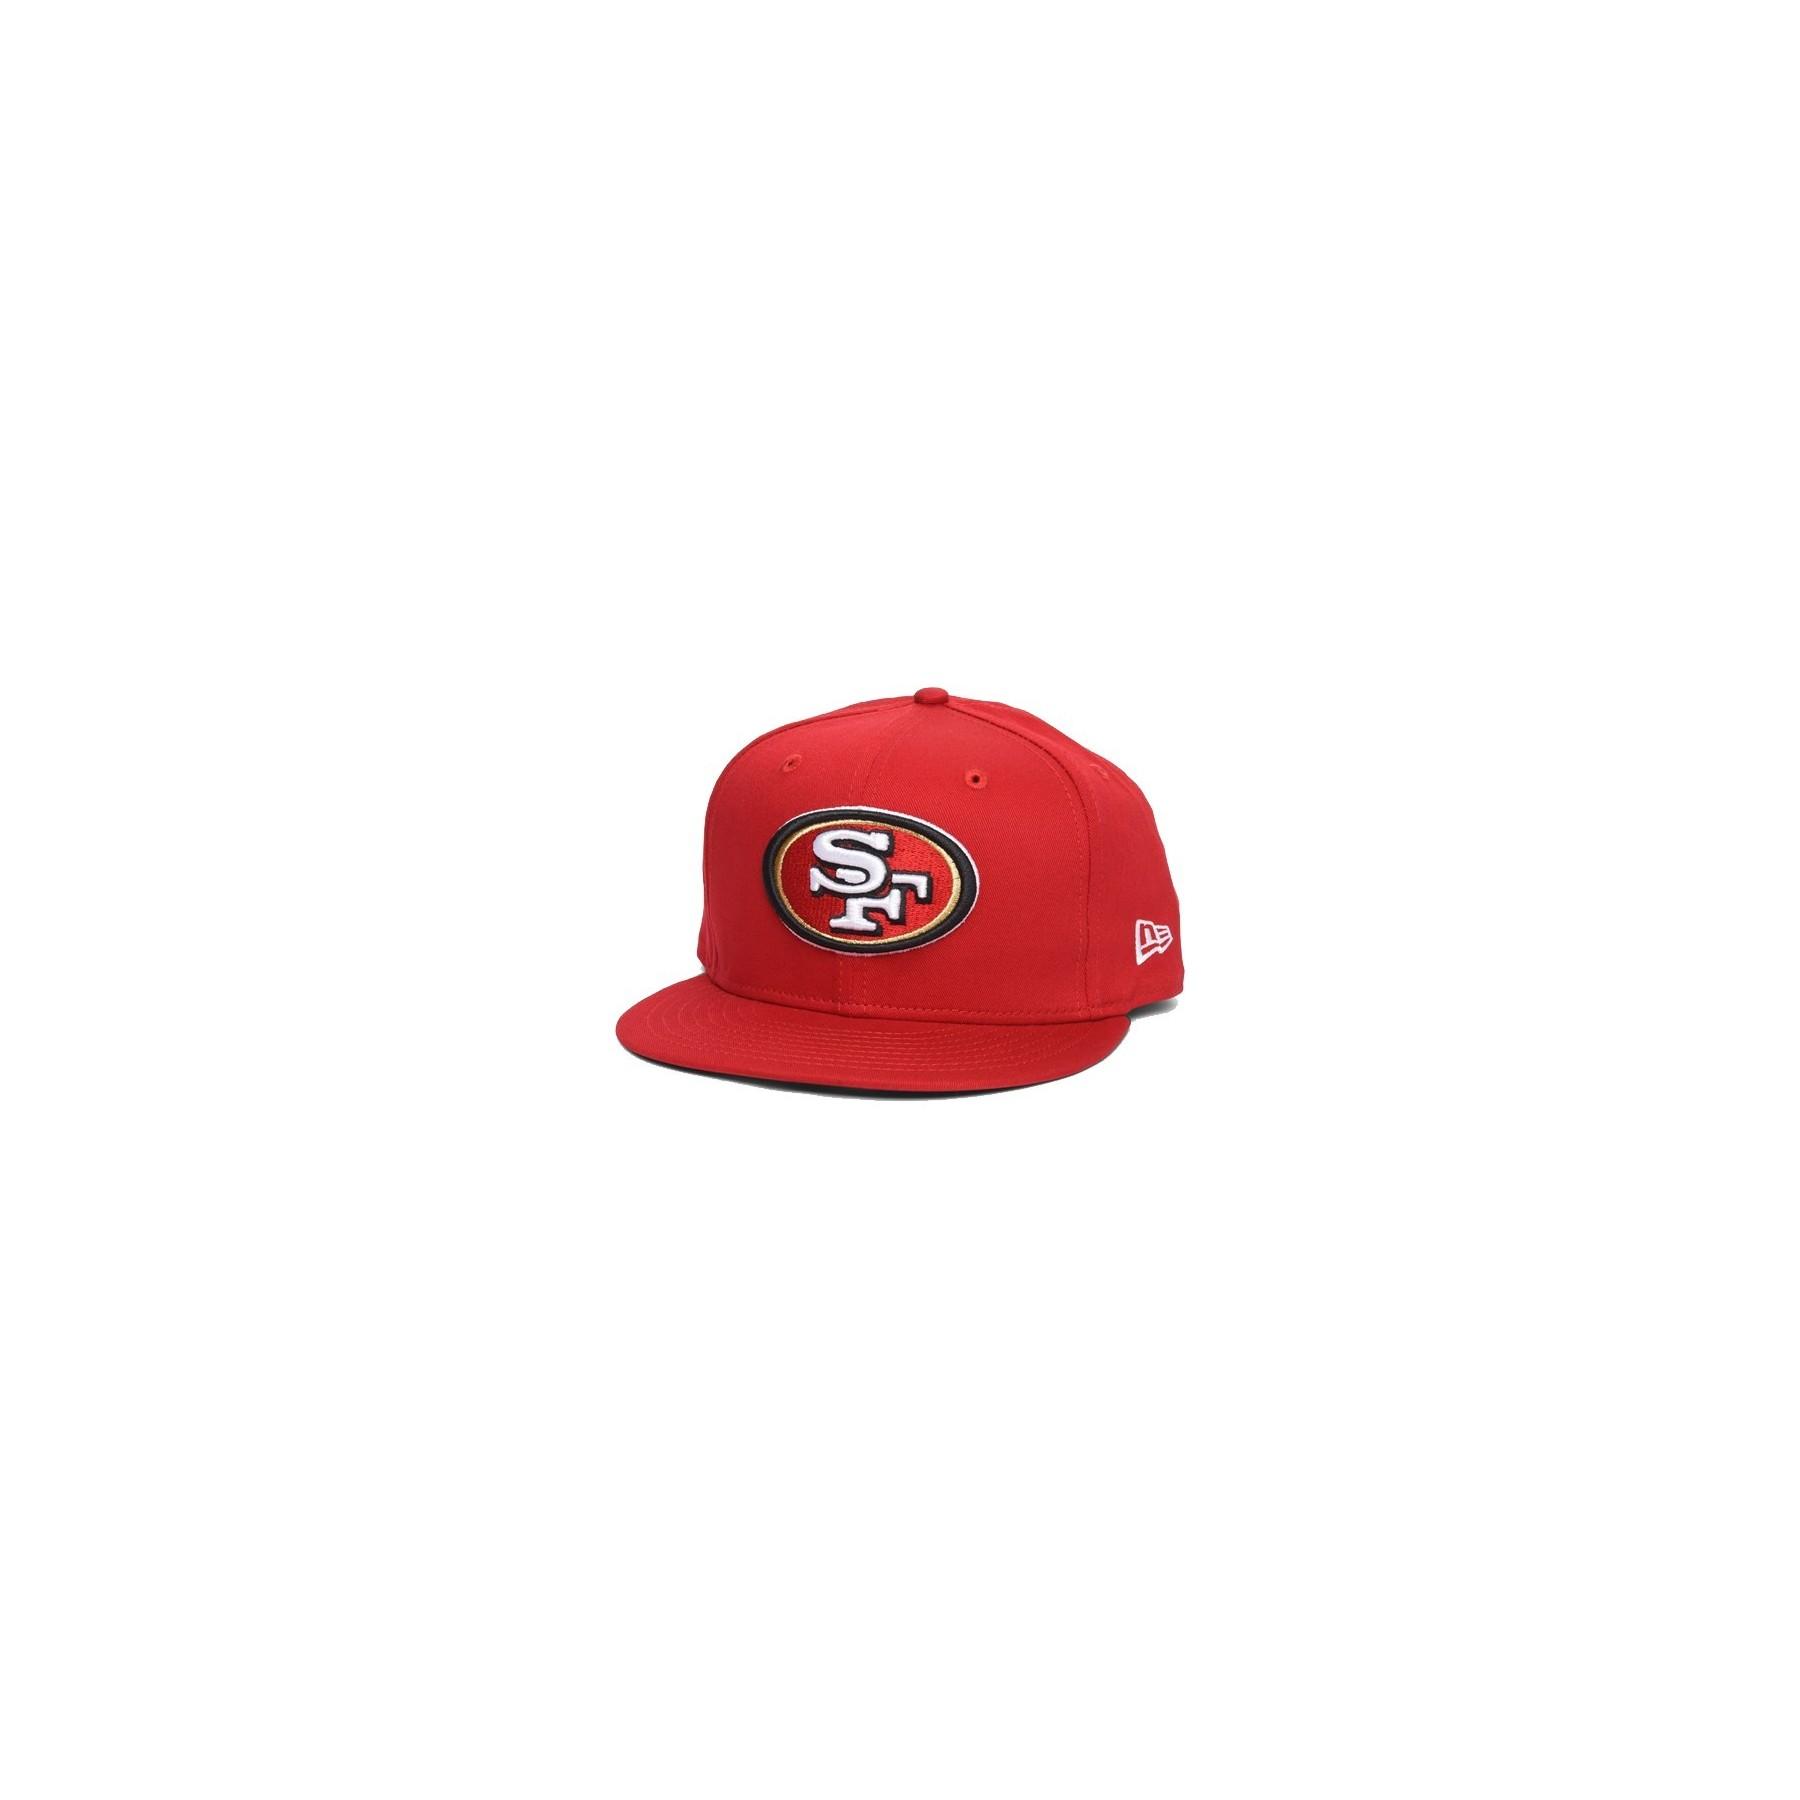 6cc15234 CAPPELLO SNAPBACK NEW ERA CAP SNAPBACK NFL SAN FRANCISCO 49ERS LOGO PRIME  Red/White unico | Atipicishop.com